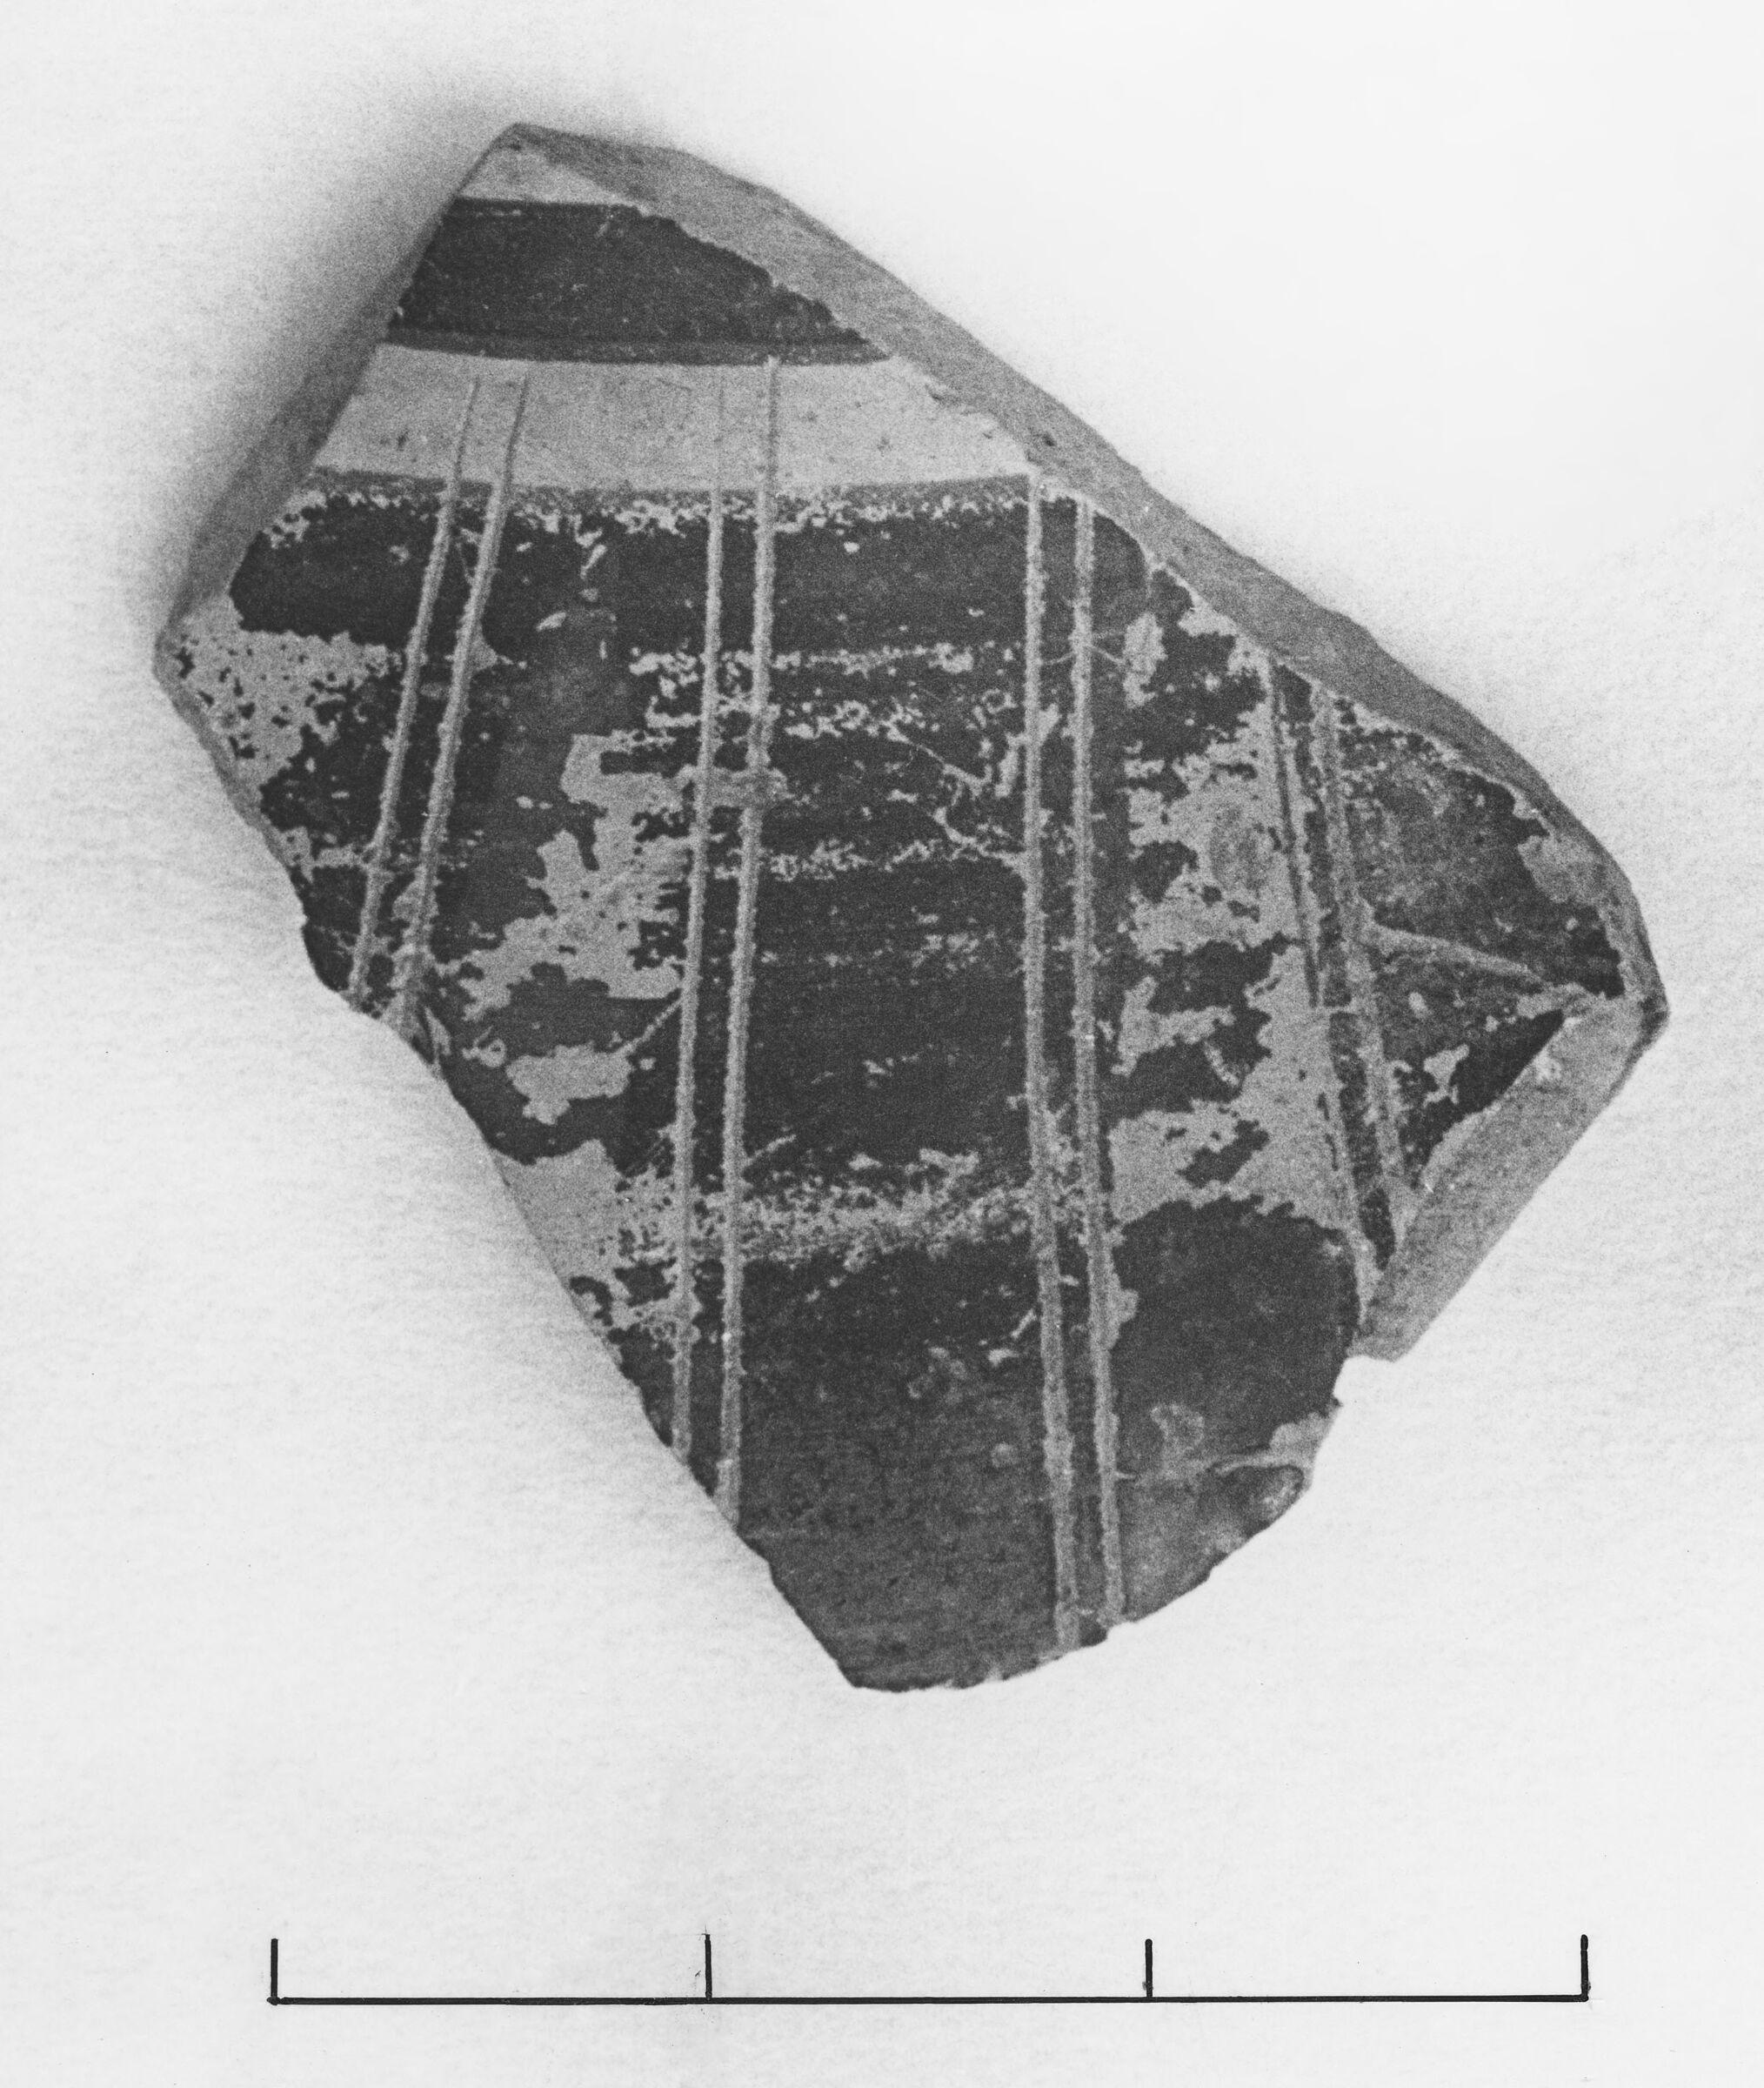 Fragment of an Early Corinthian Football (Gourd) Aryballos